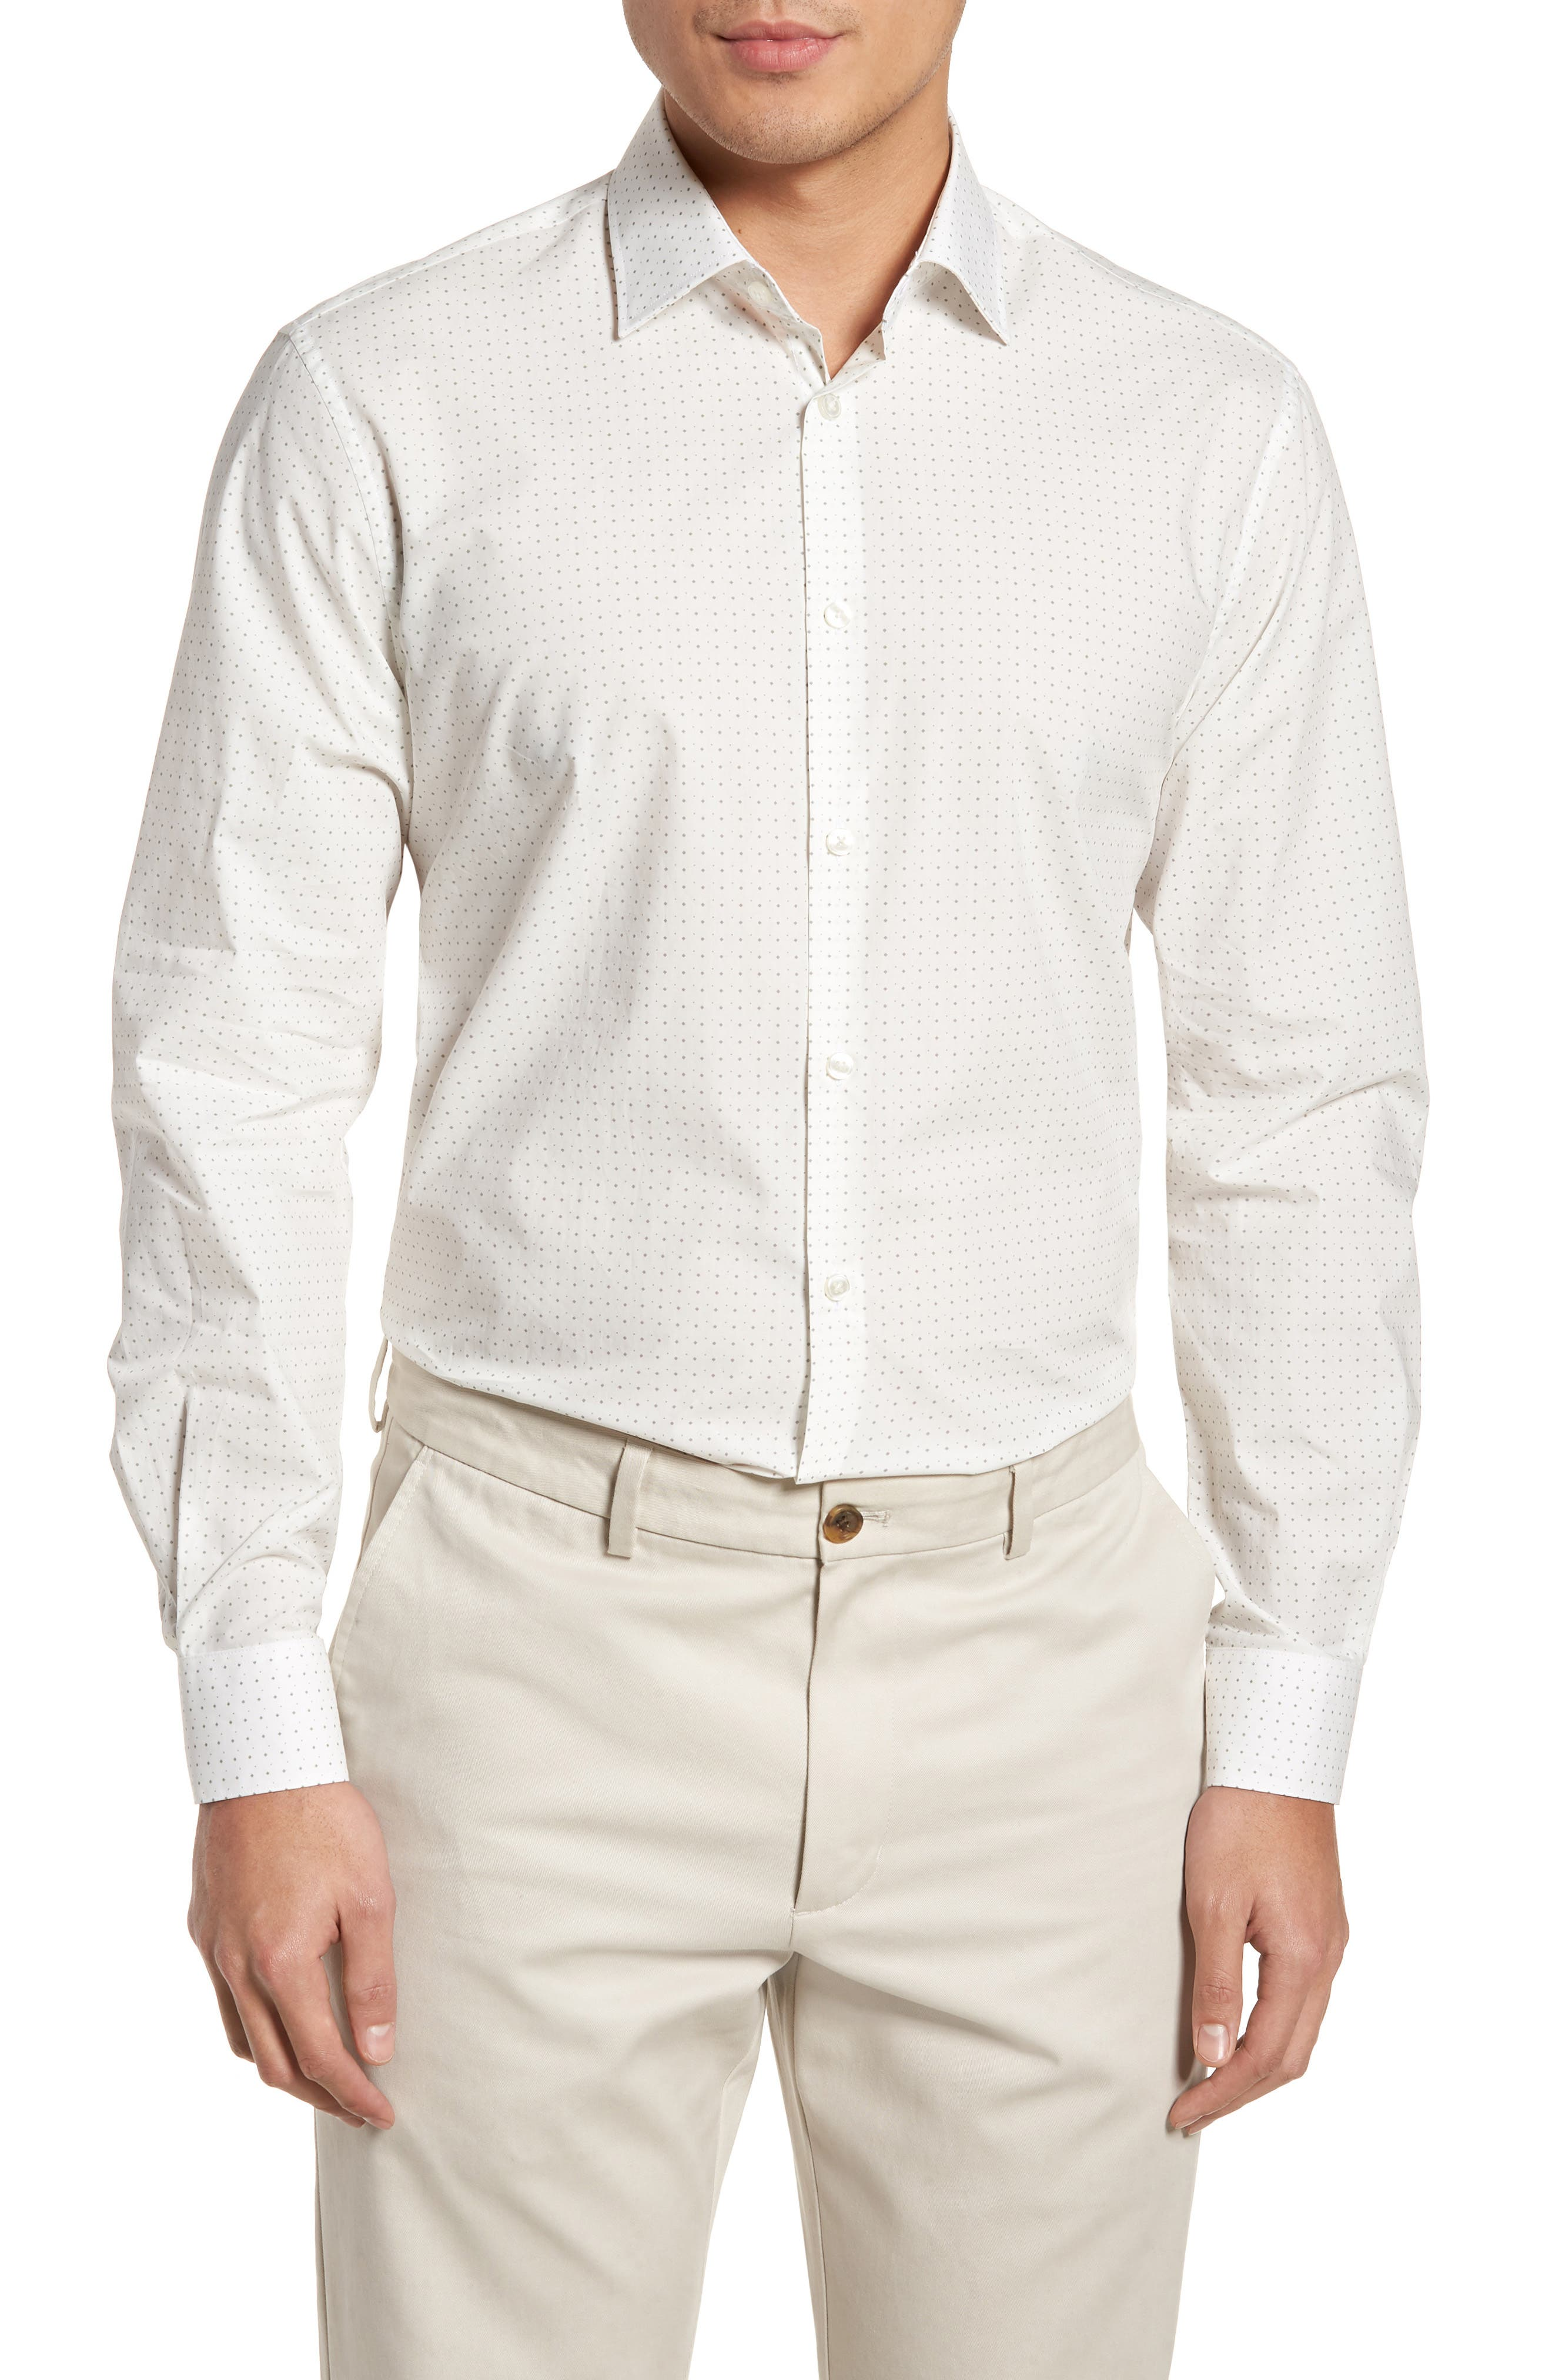 Regular Fit Diamond Dress Shirt,                             Main thumbnail 1, color,                             GRIFFIN GREY